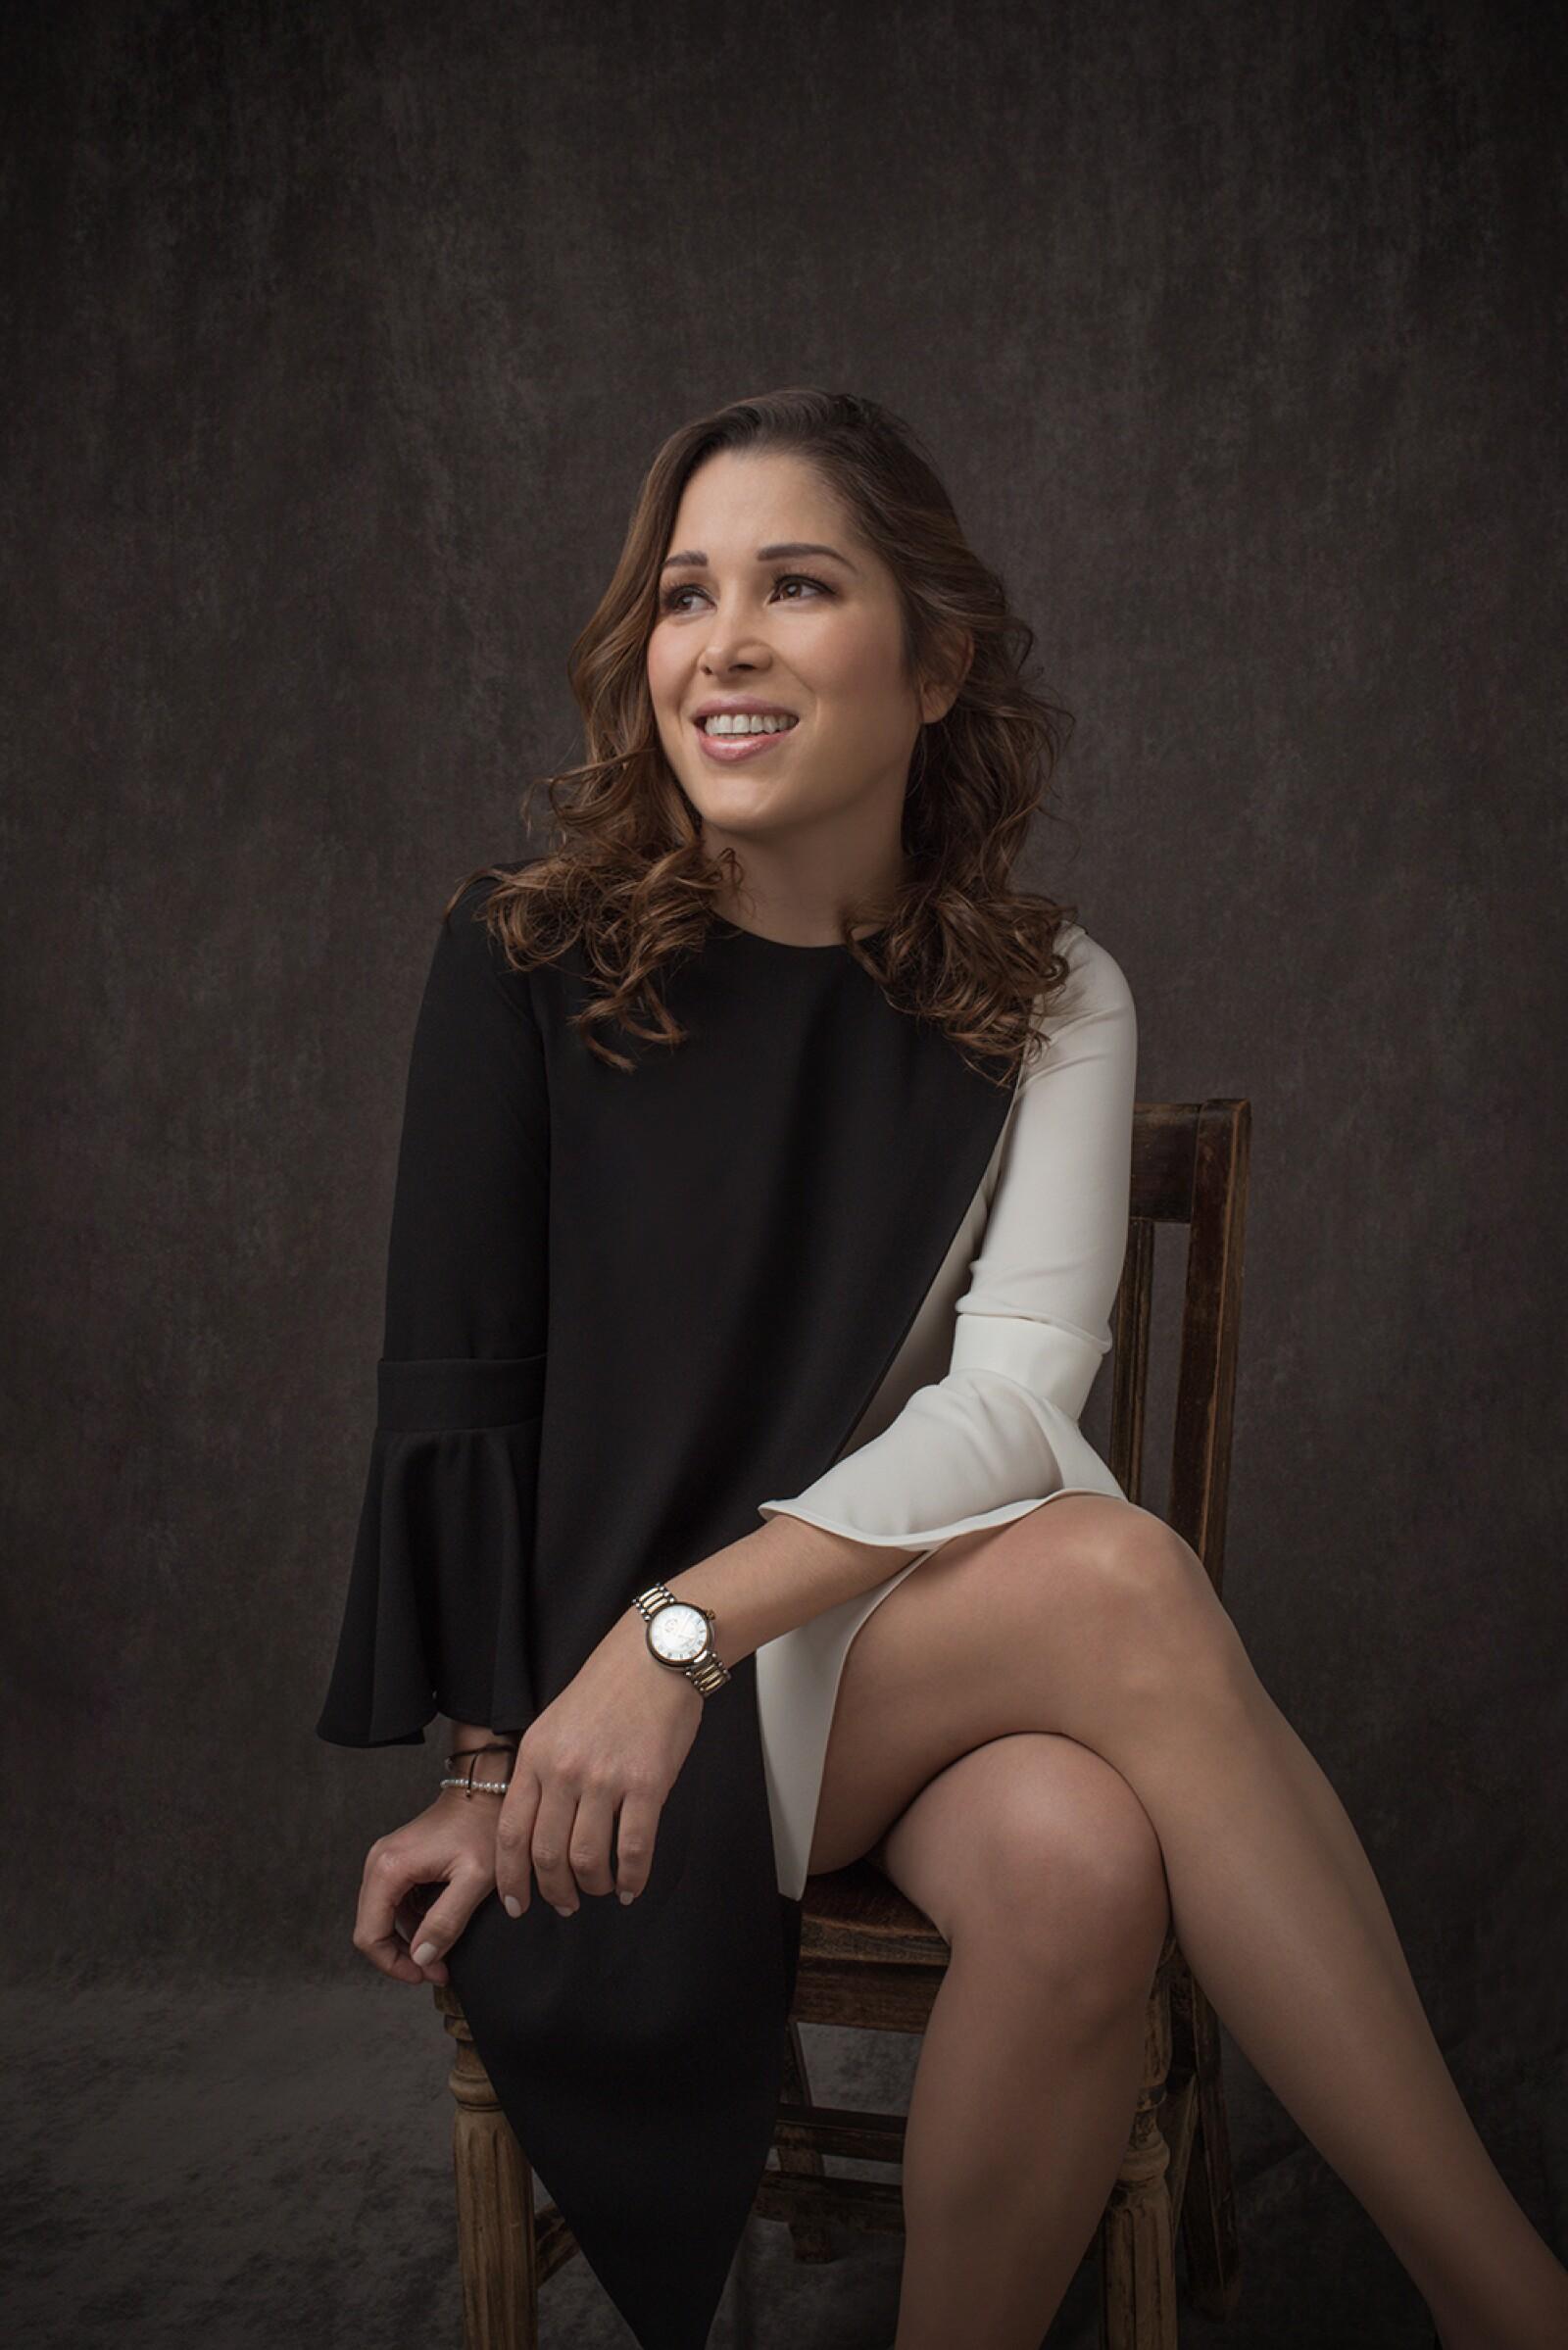 Ximena Puente